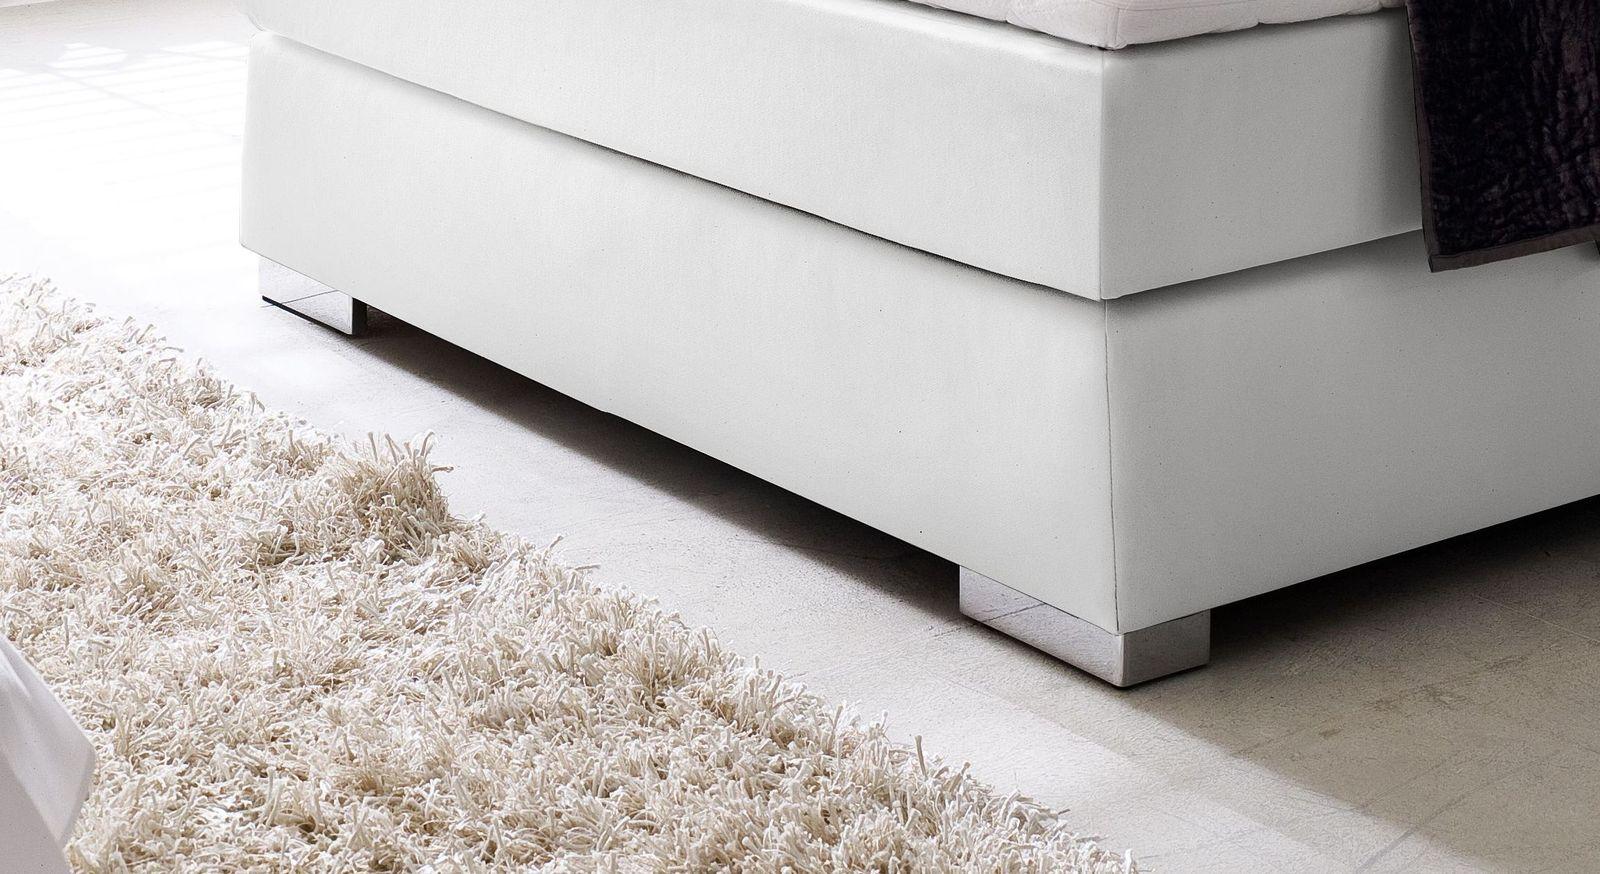 Boxspringbett metall  Boxspringbett aus Kunstleder in Weiß mit Nackenrolle - Rimori